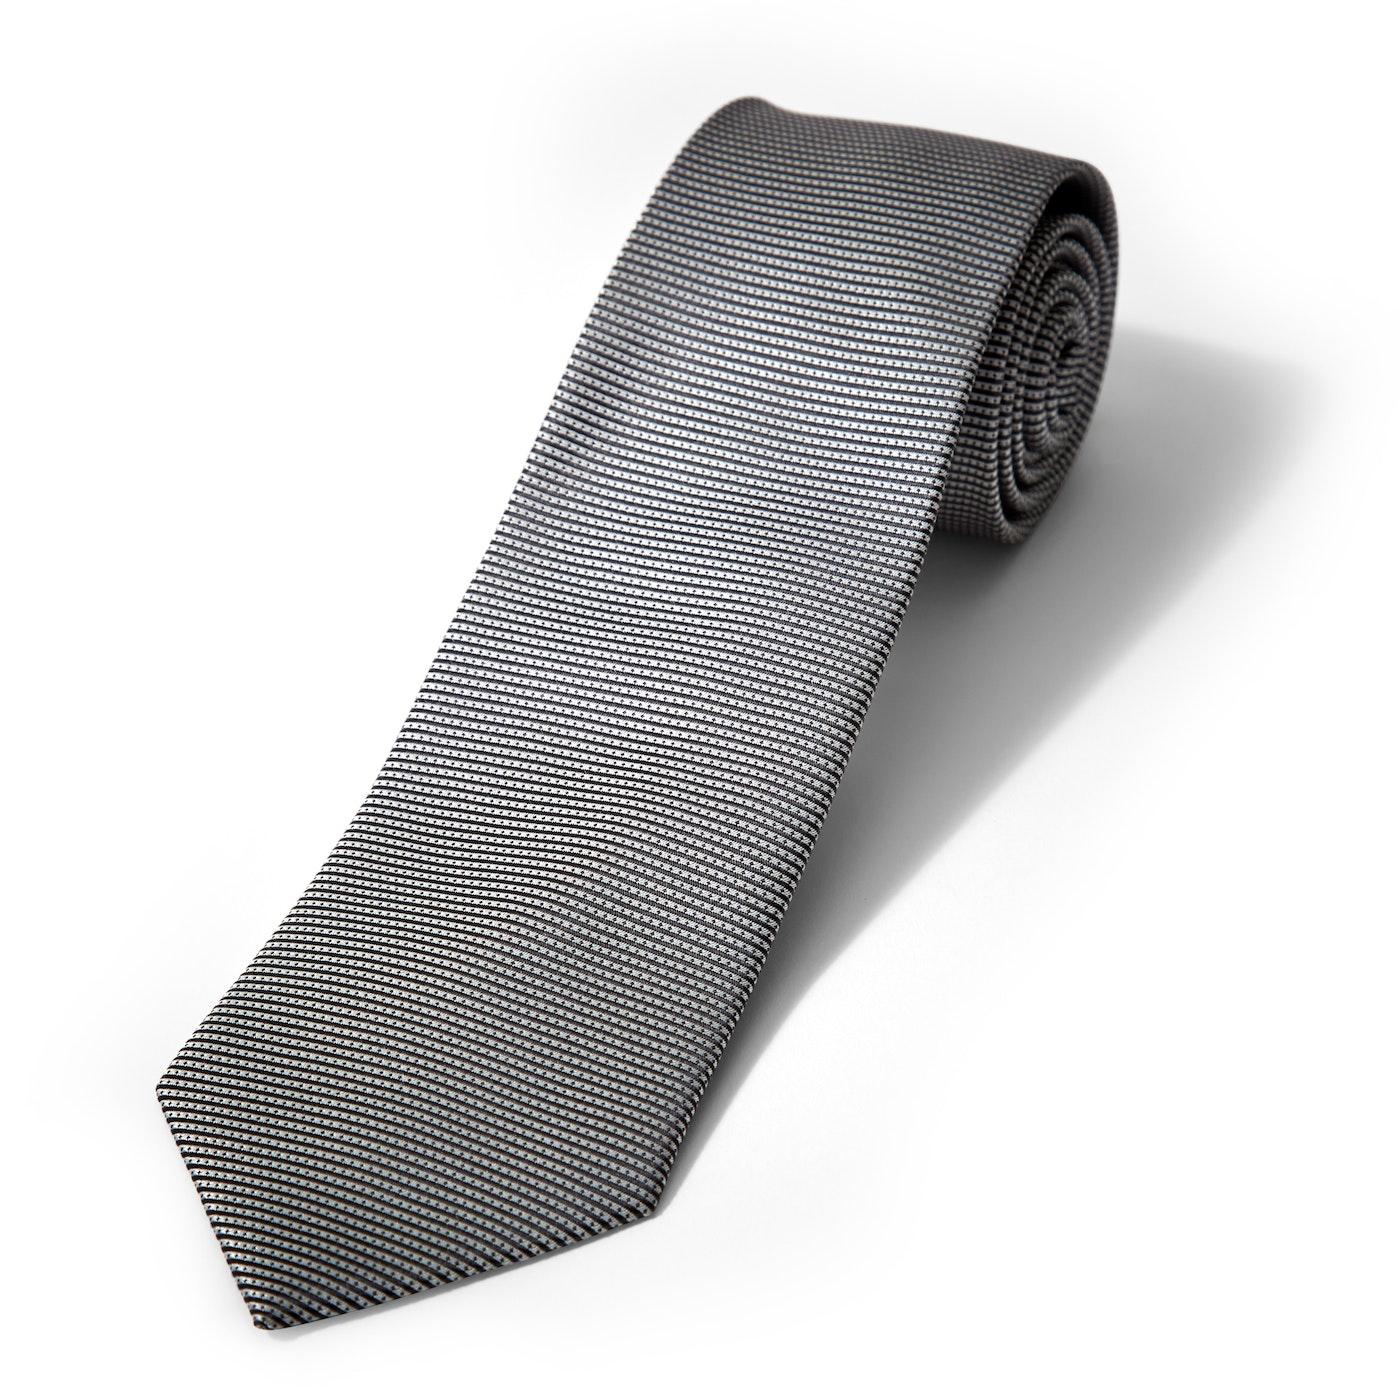 Iridescent Platinum Dobby Tie